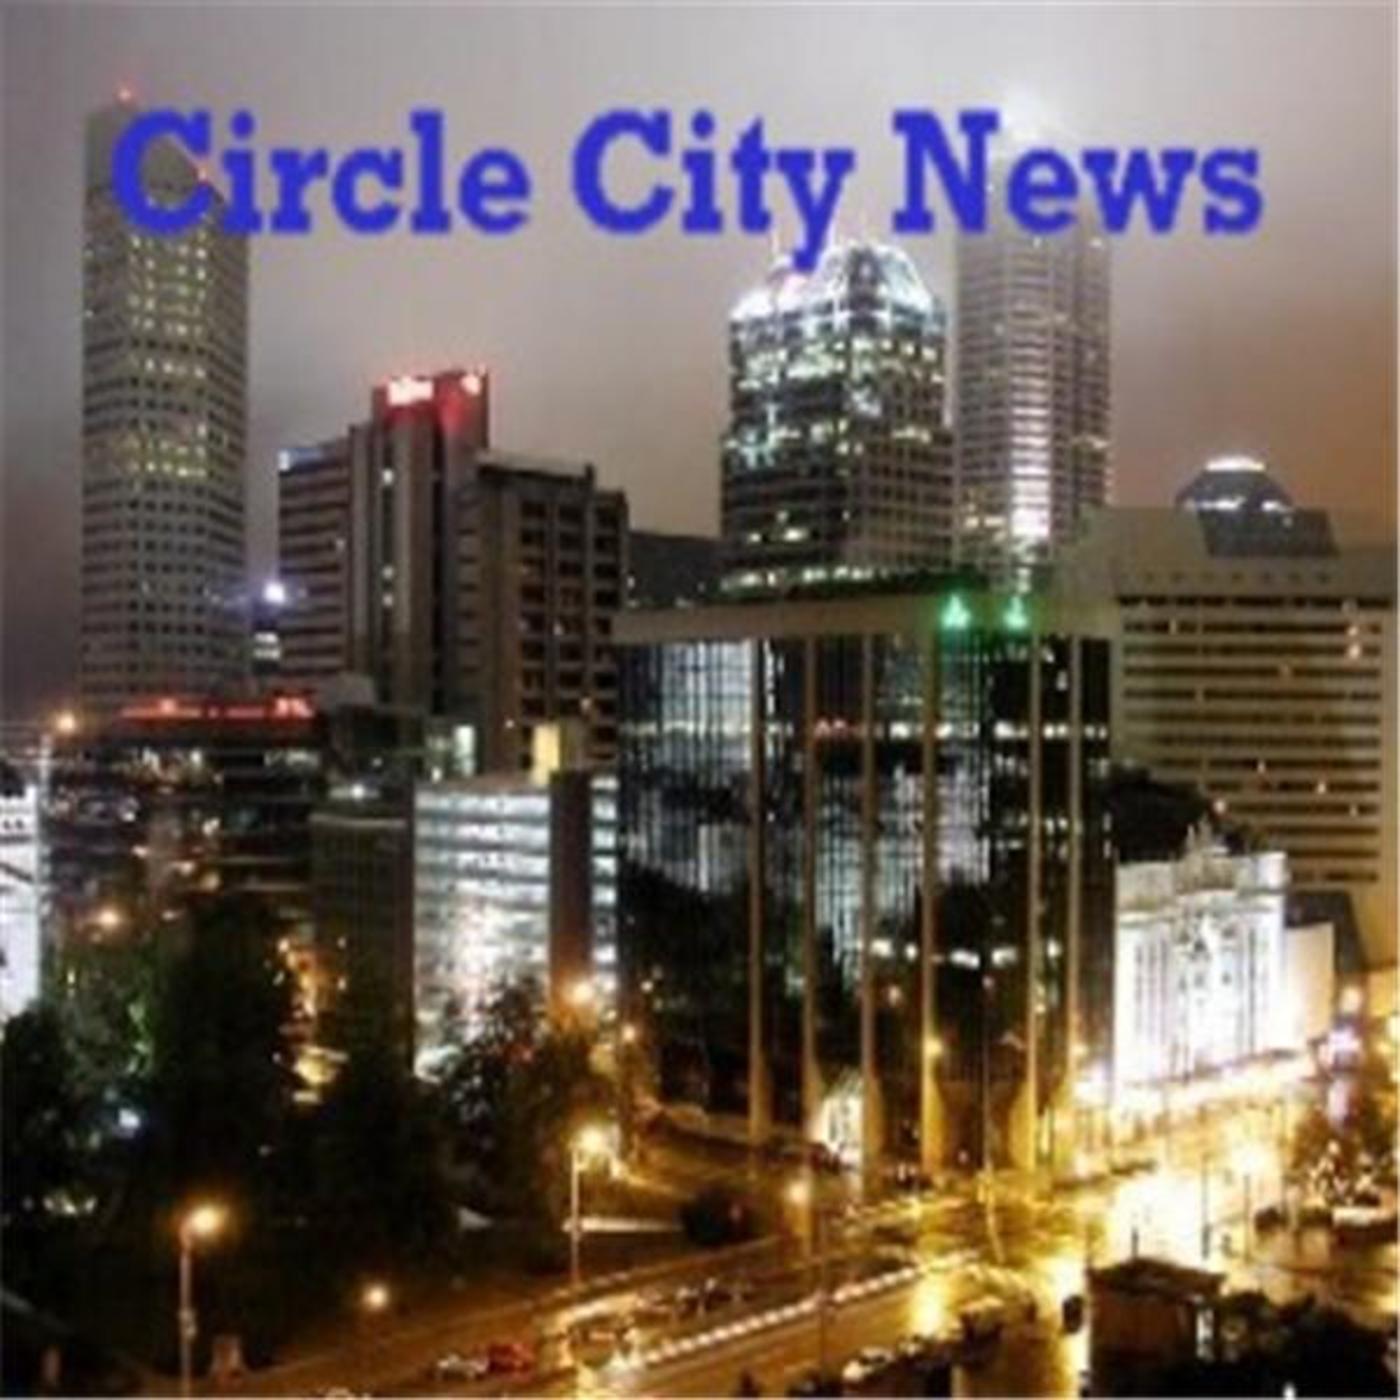 Circle City News™: An Indianapolis Internet Talk Radio Show